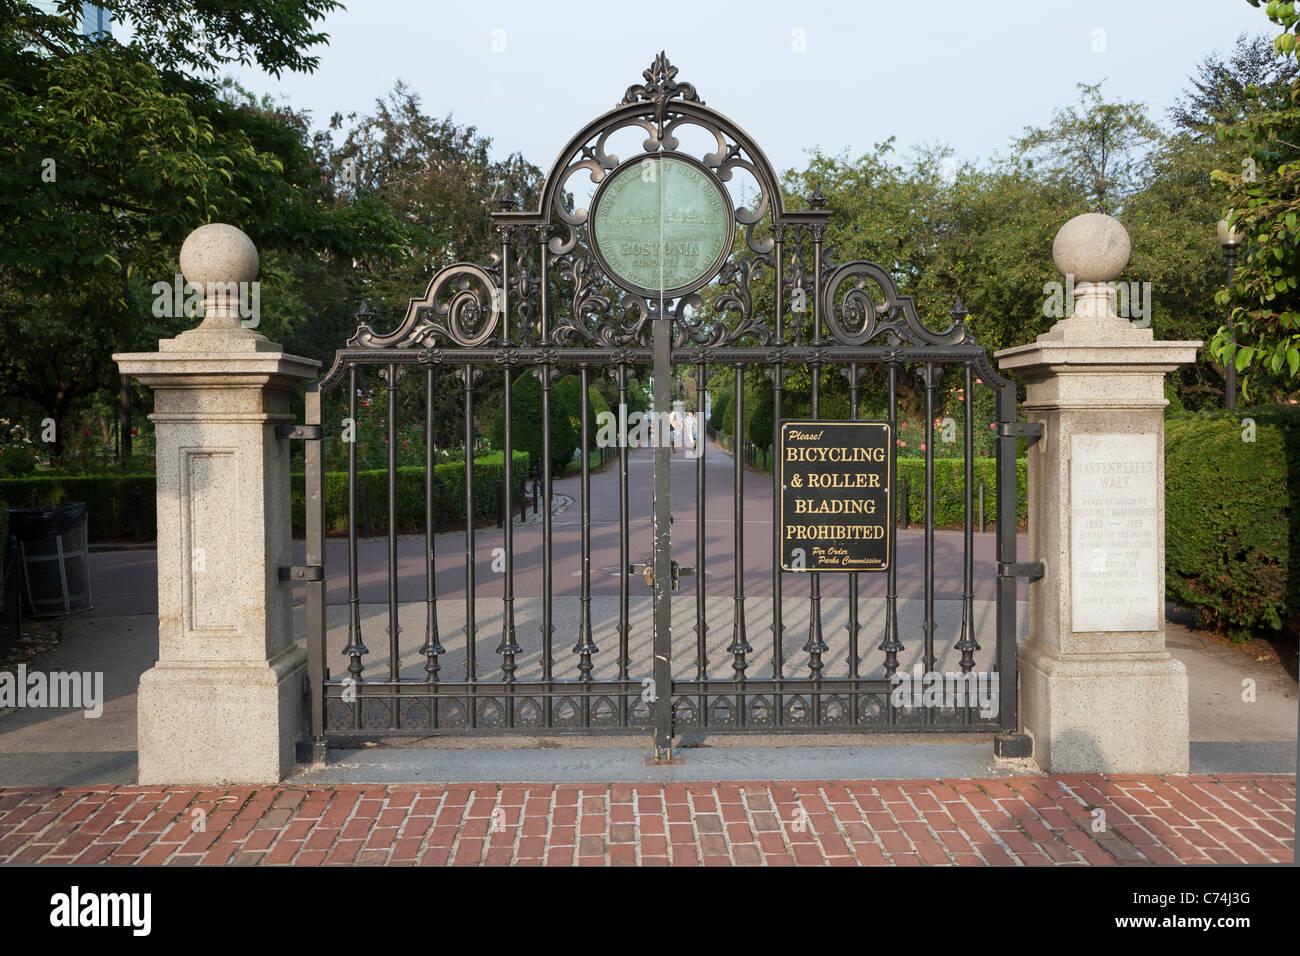 Entrance gate to the Boston Public Garden and Haffenreffer Walk on Charles street in Boston, Massachusetts. - Stock Image